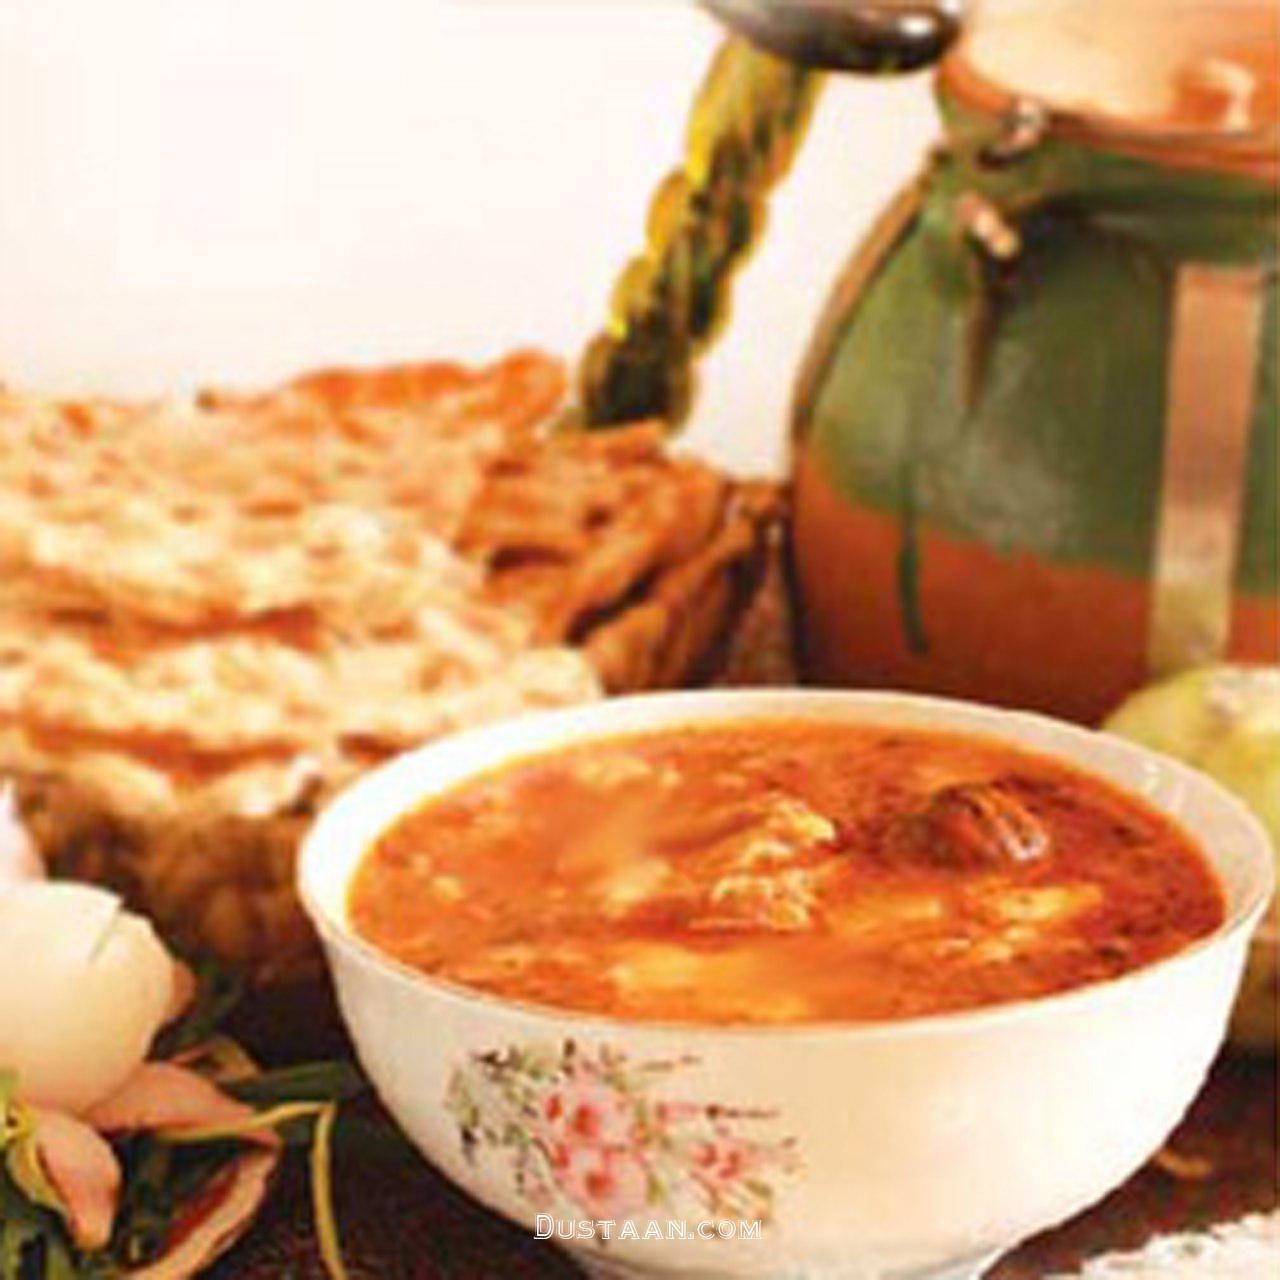 www.dustaan.com طرز تهیه آبگوشت لپه به سبکی آسان و خوشمزه